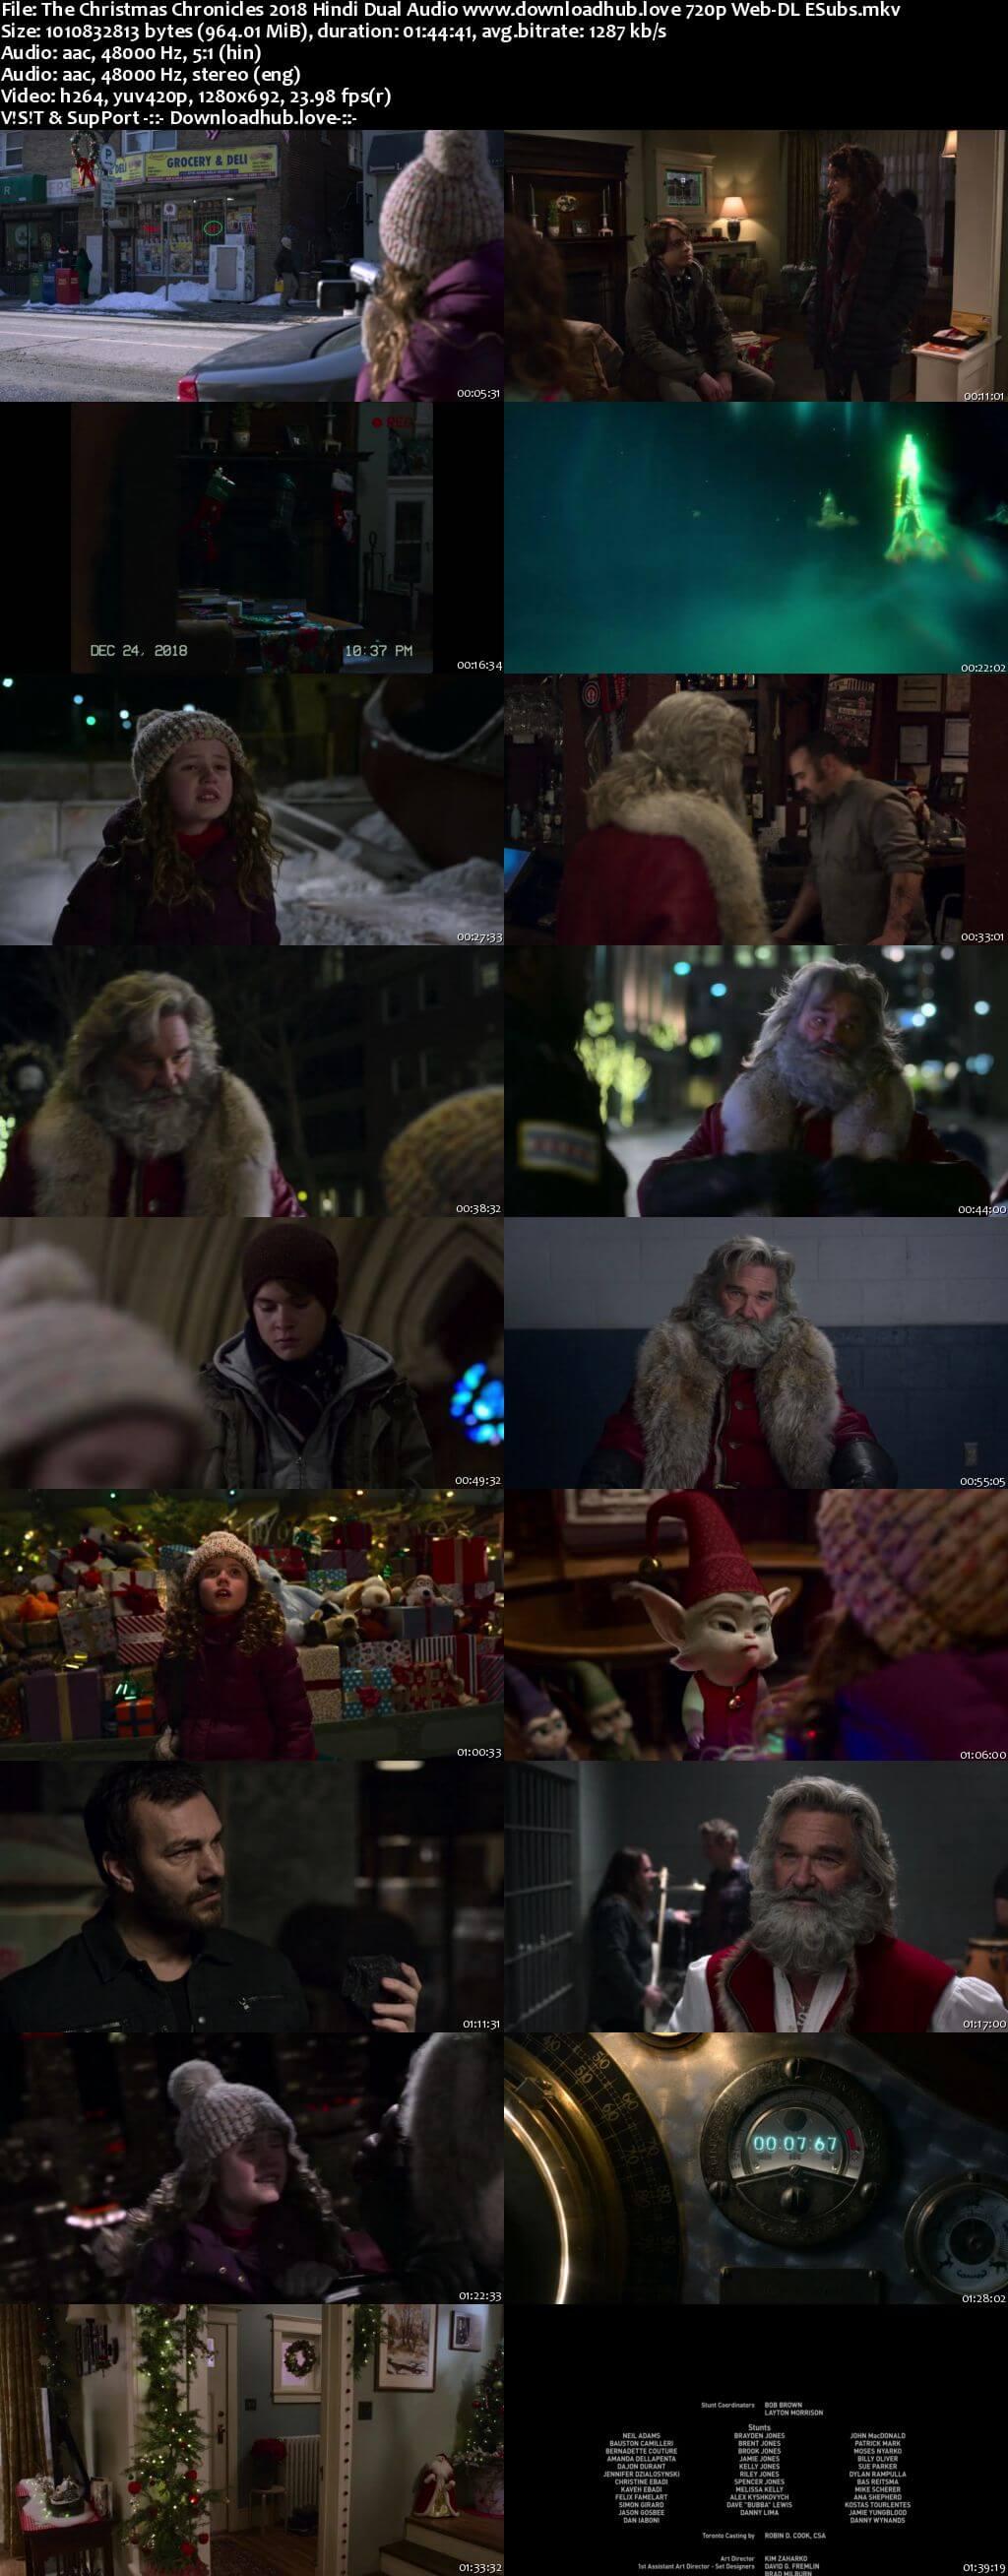 The Christmas Chronicles 2018 Hindi Dual Audio 720p Web-DL ESubs